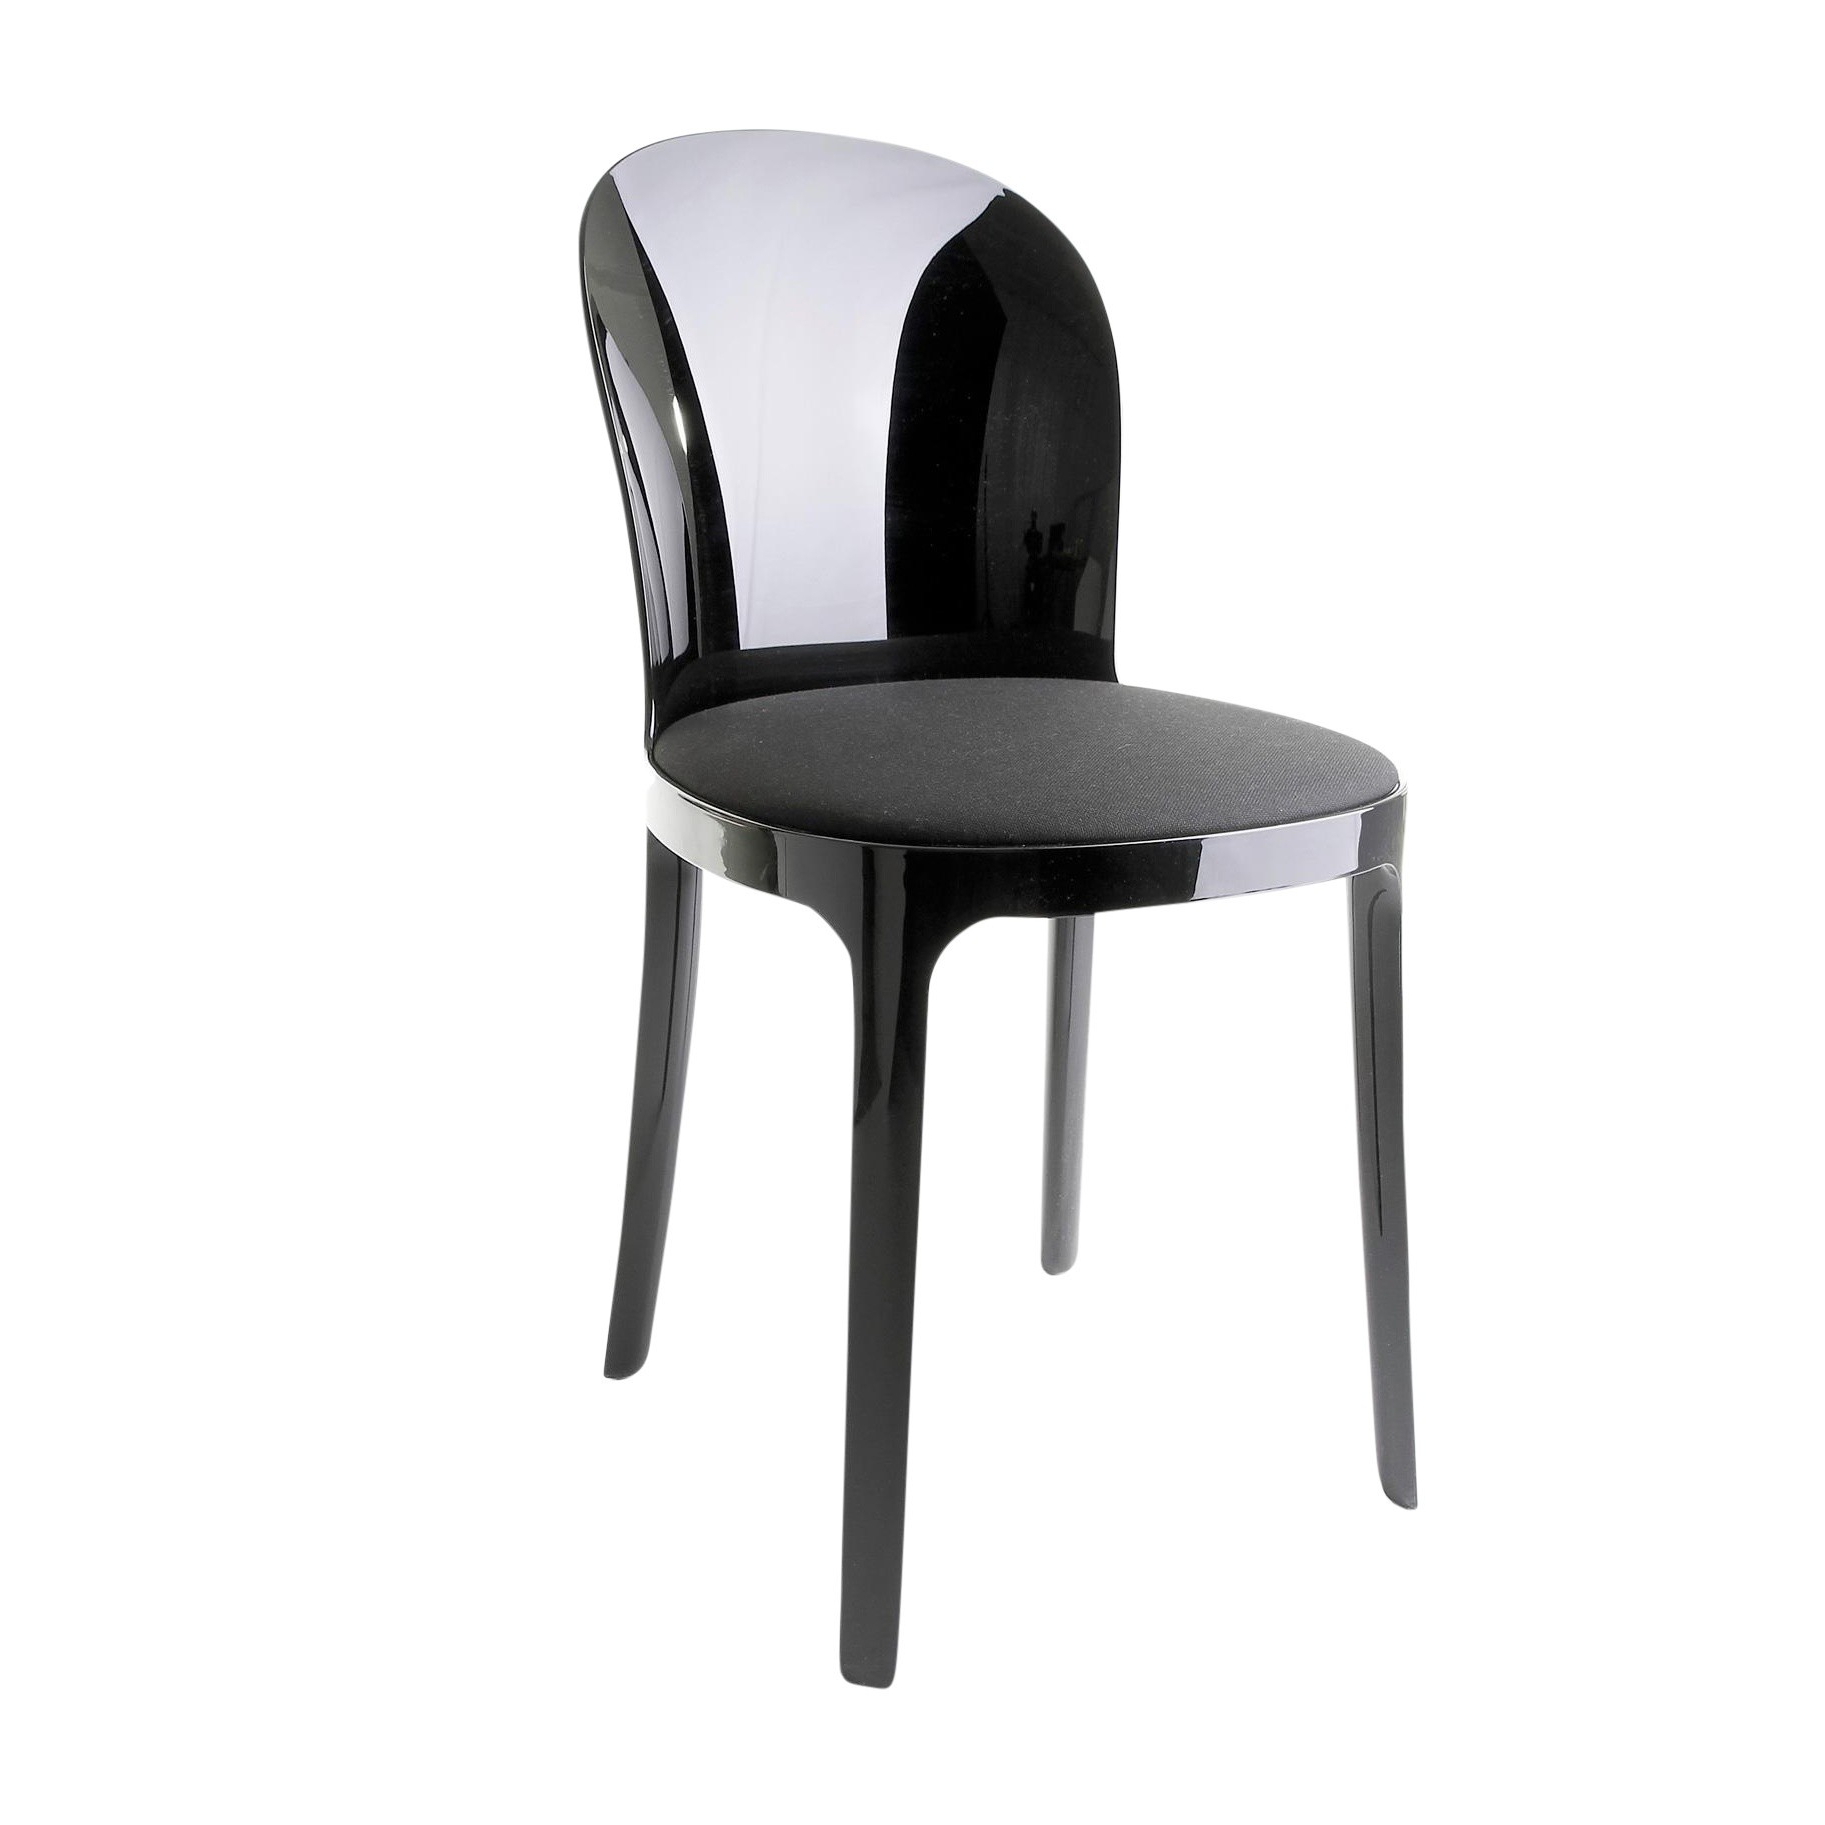 Silla Negra S5d8 Magis Vanity Chair Silla Negra Ambientedirect